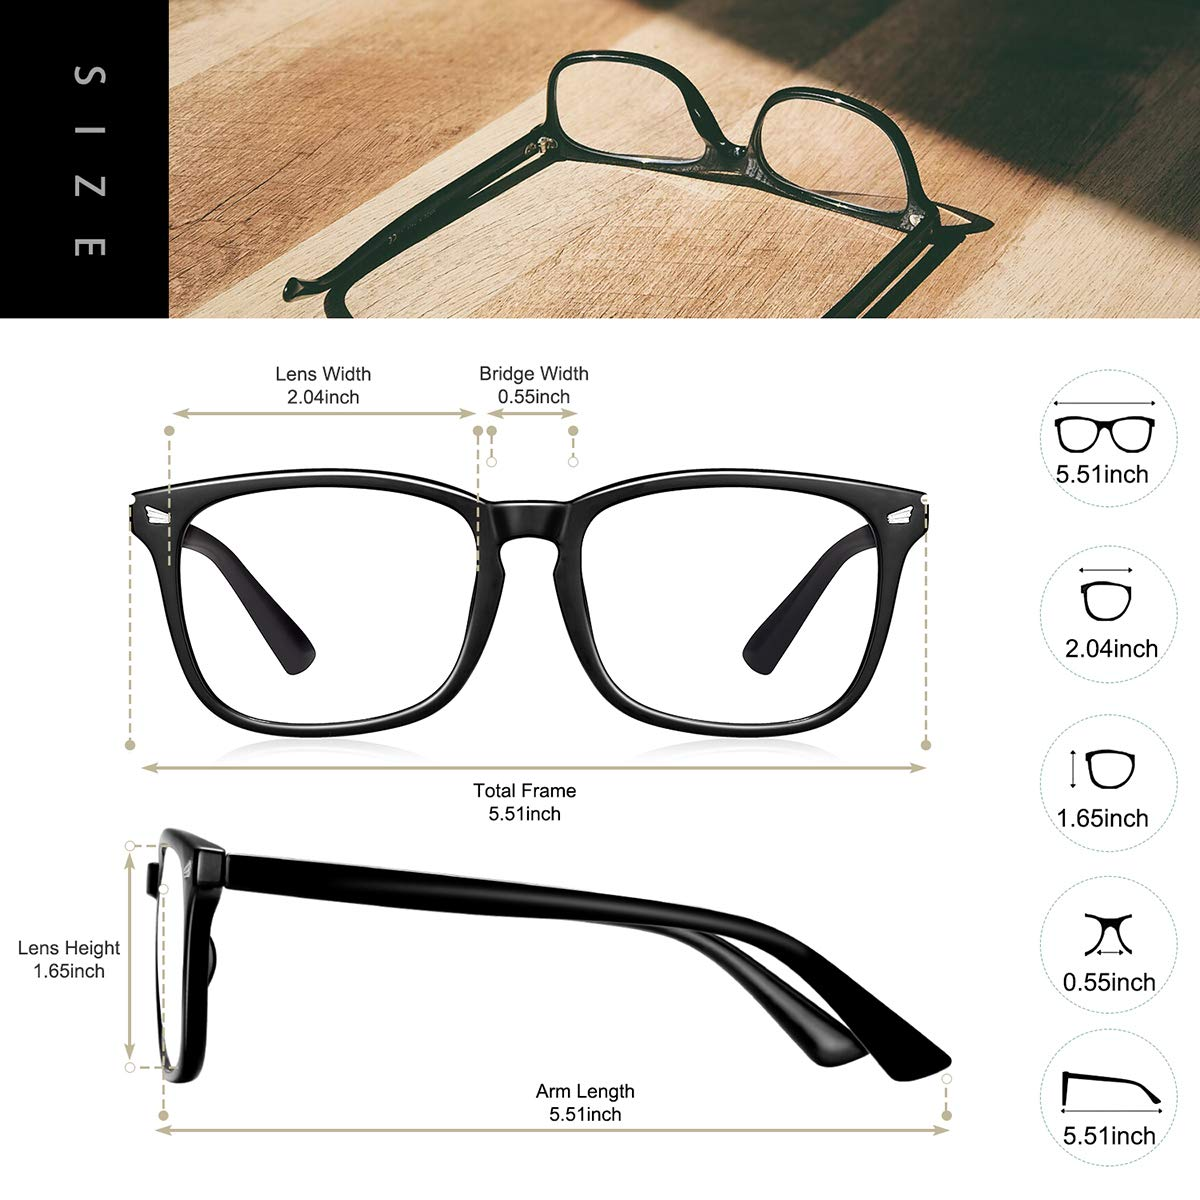 Nerd Reading Gaming Glasses Non Prescription Blue Light Blocking Glasses 2pack Square Computer Glasses Women//Men